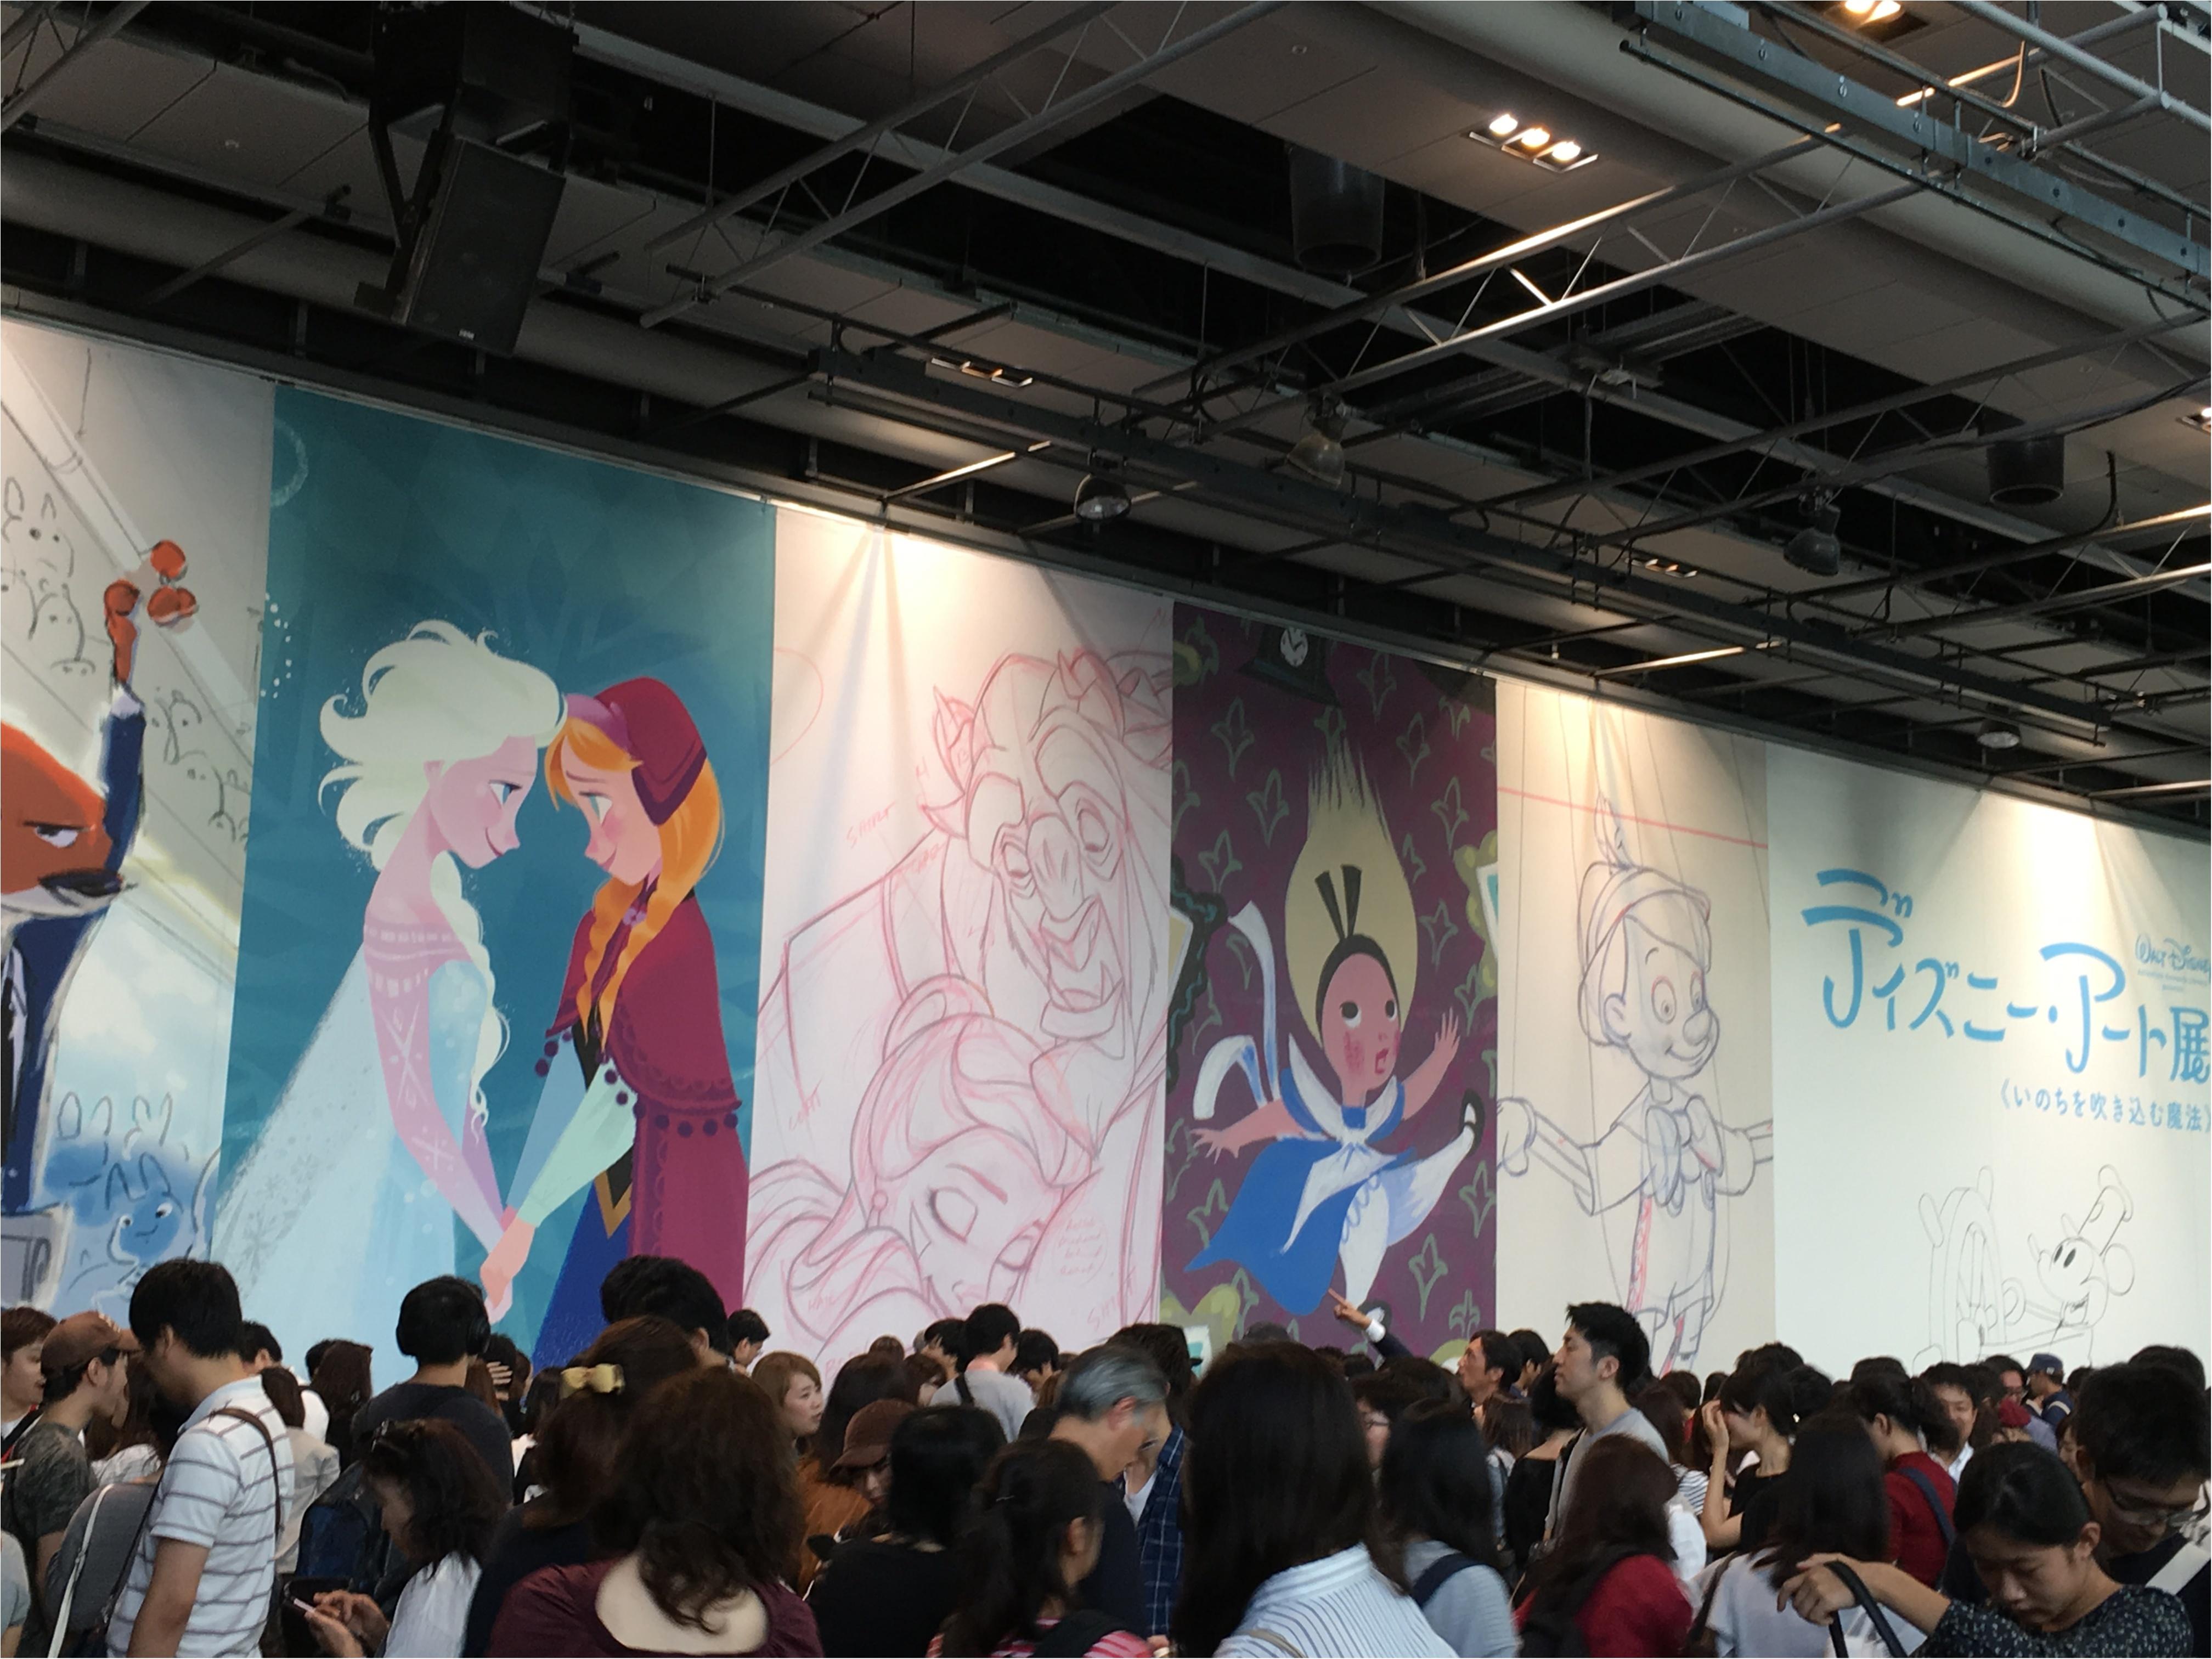 【Disney】気分はまさにラプンツェル♡♡本日まで開催しているディズニーアート展へ行ってきました!!_1